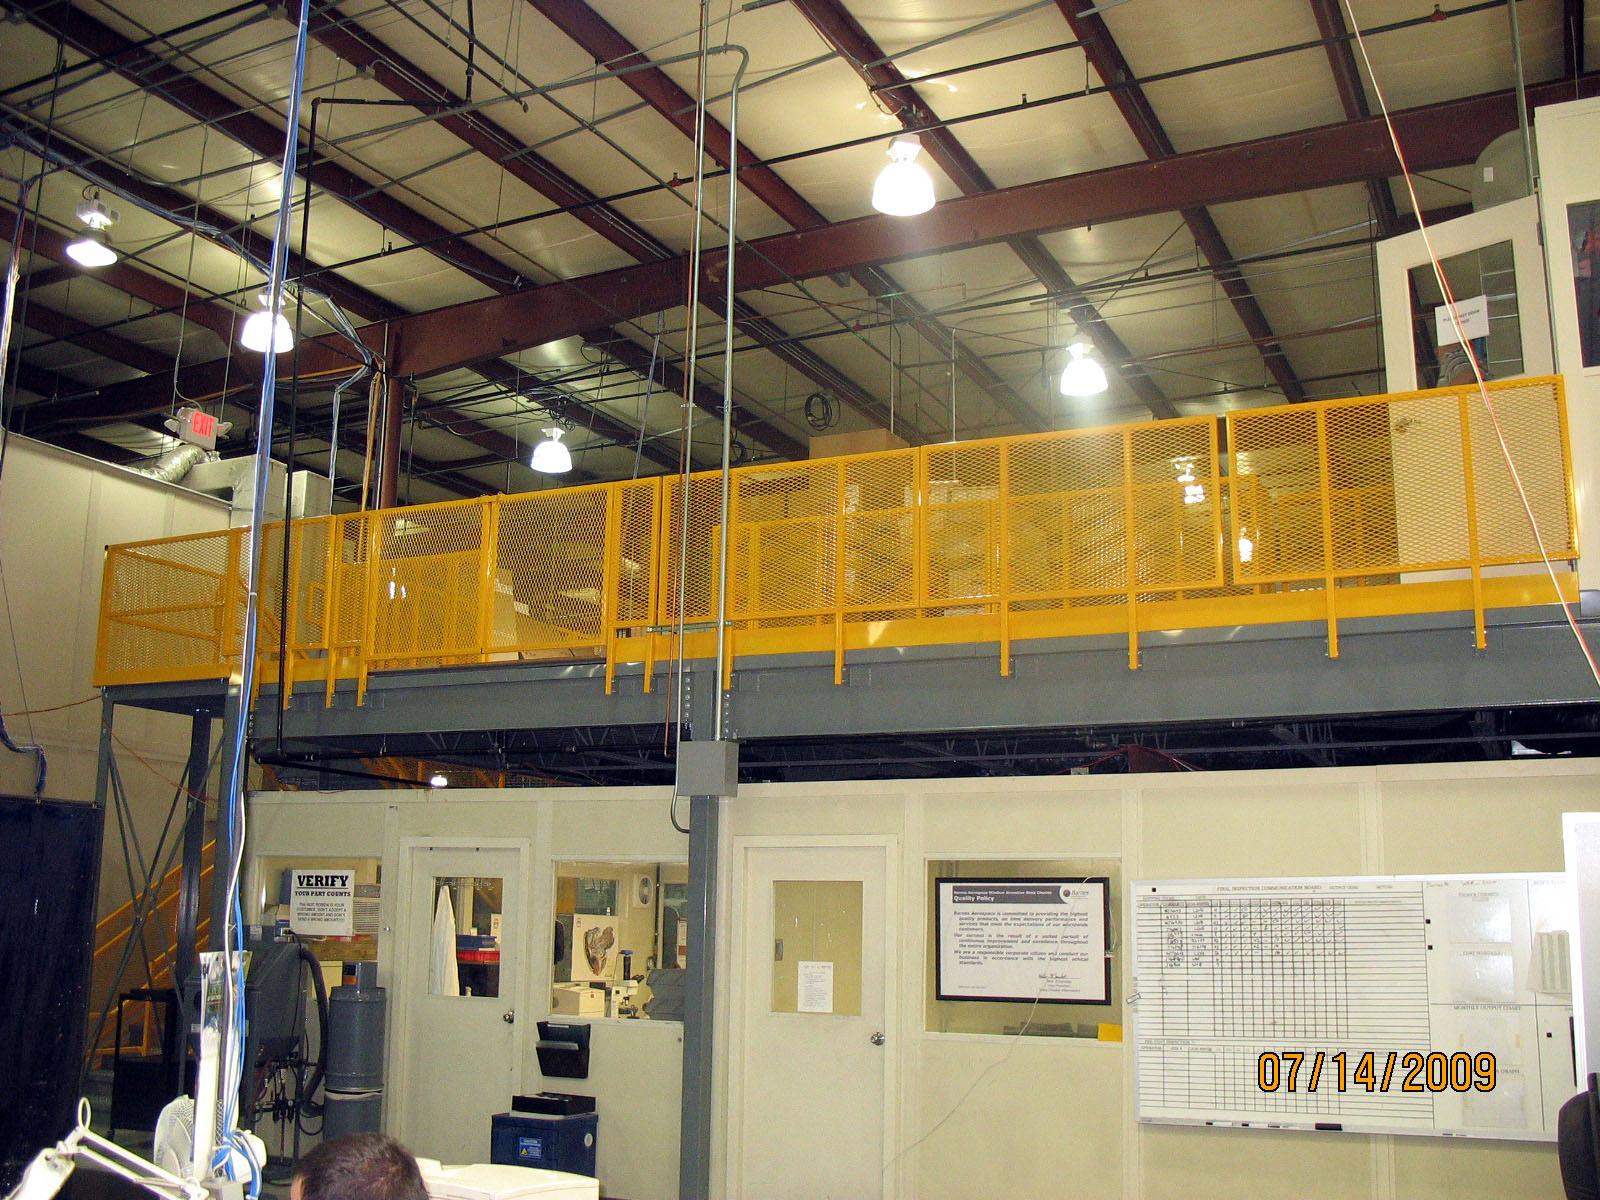 warehouse mezzanine modular office. Mezzanine Over Office Warehouse Modular